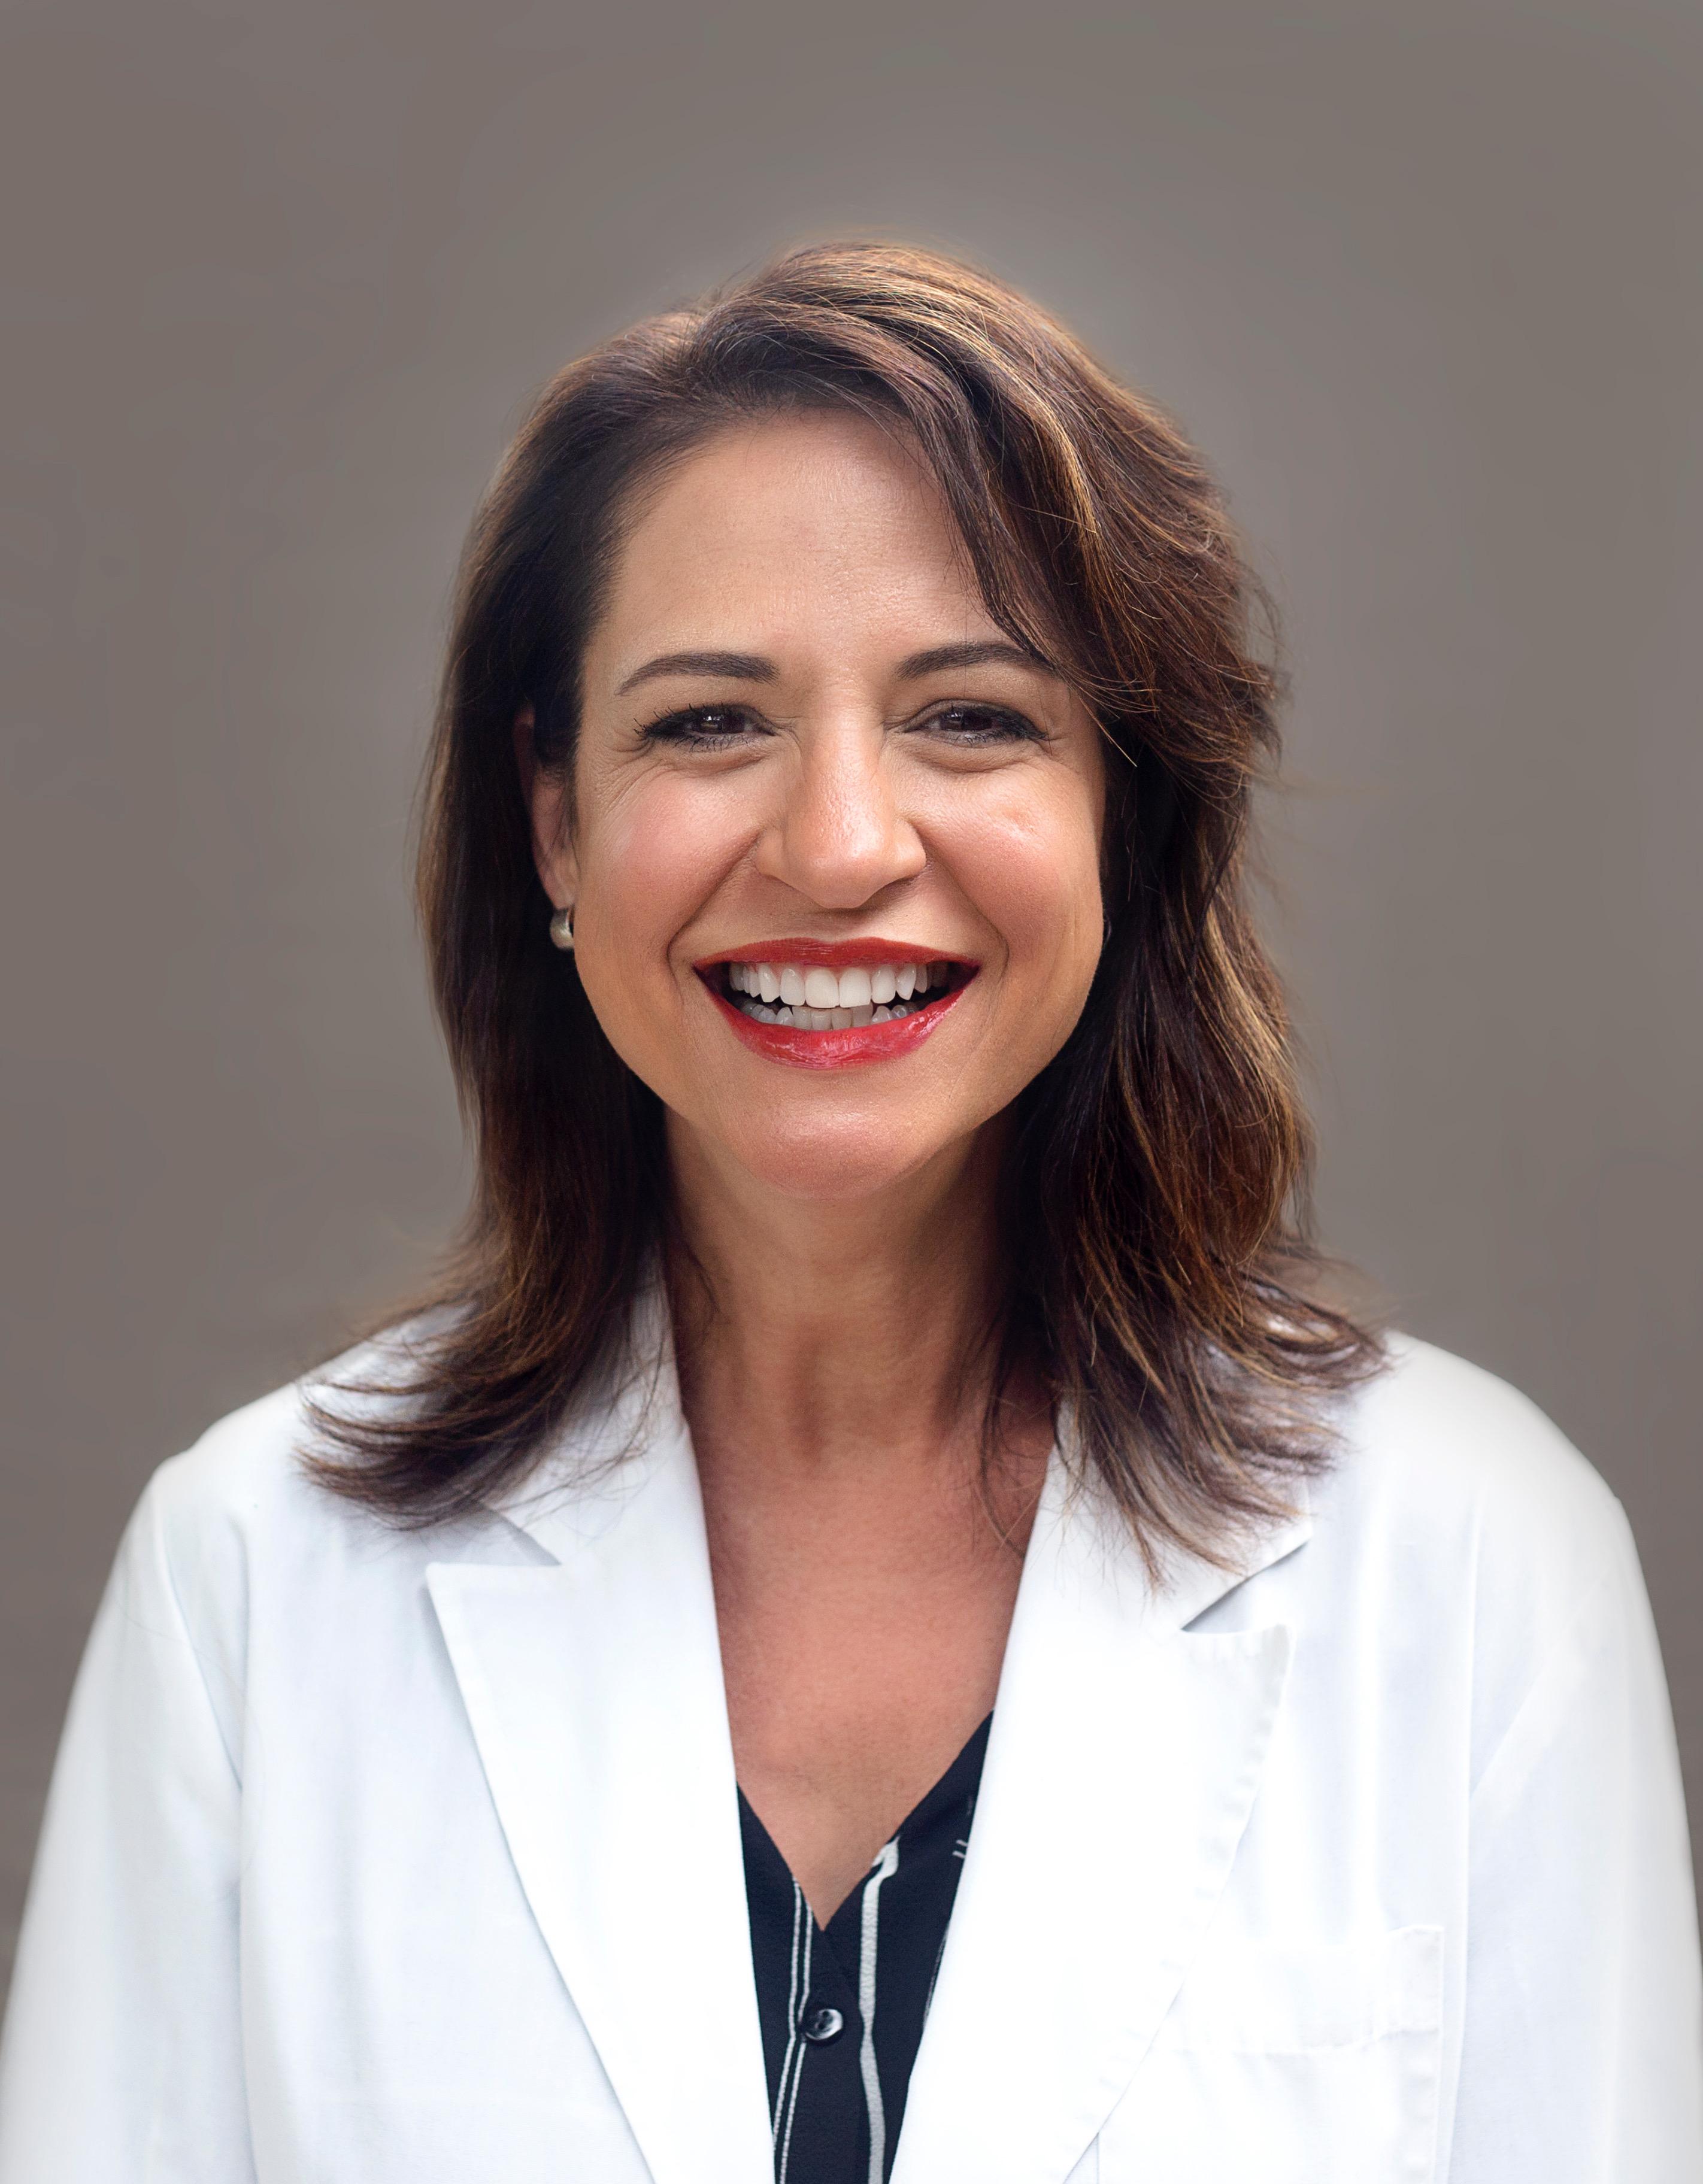 Lisa Wright, APRN